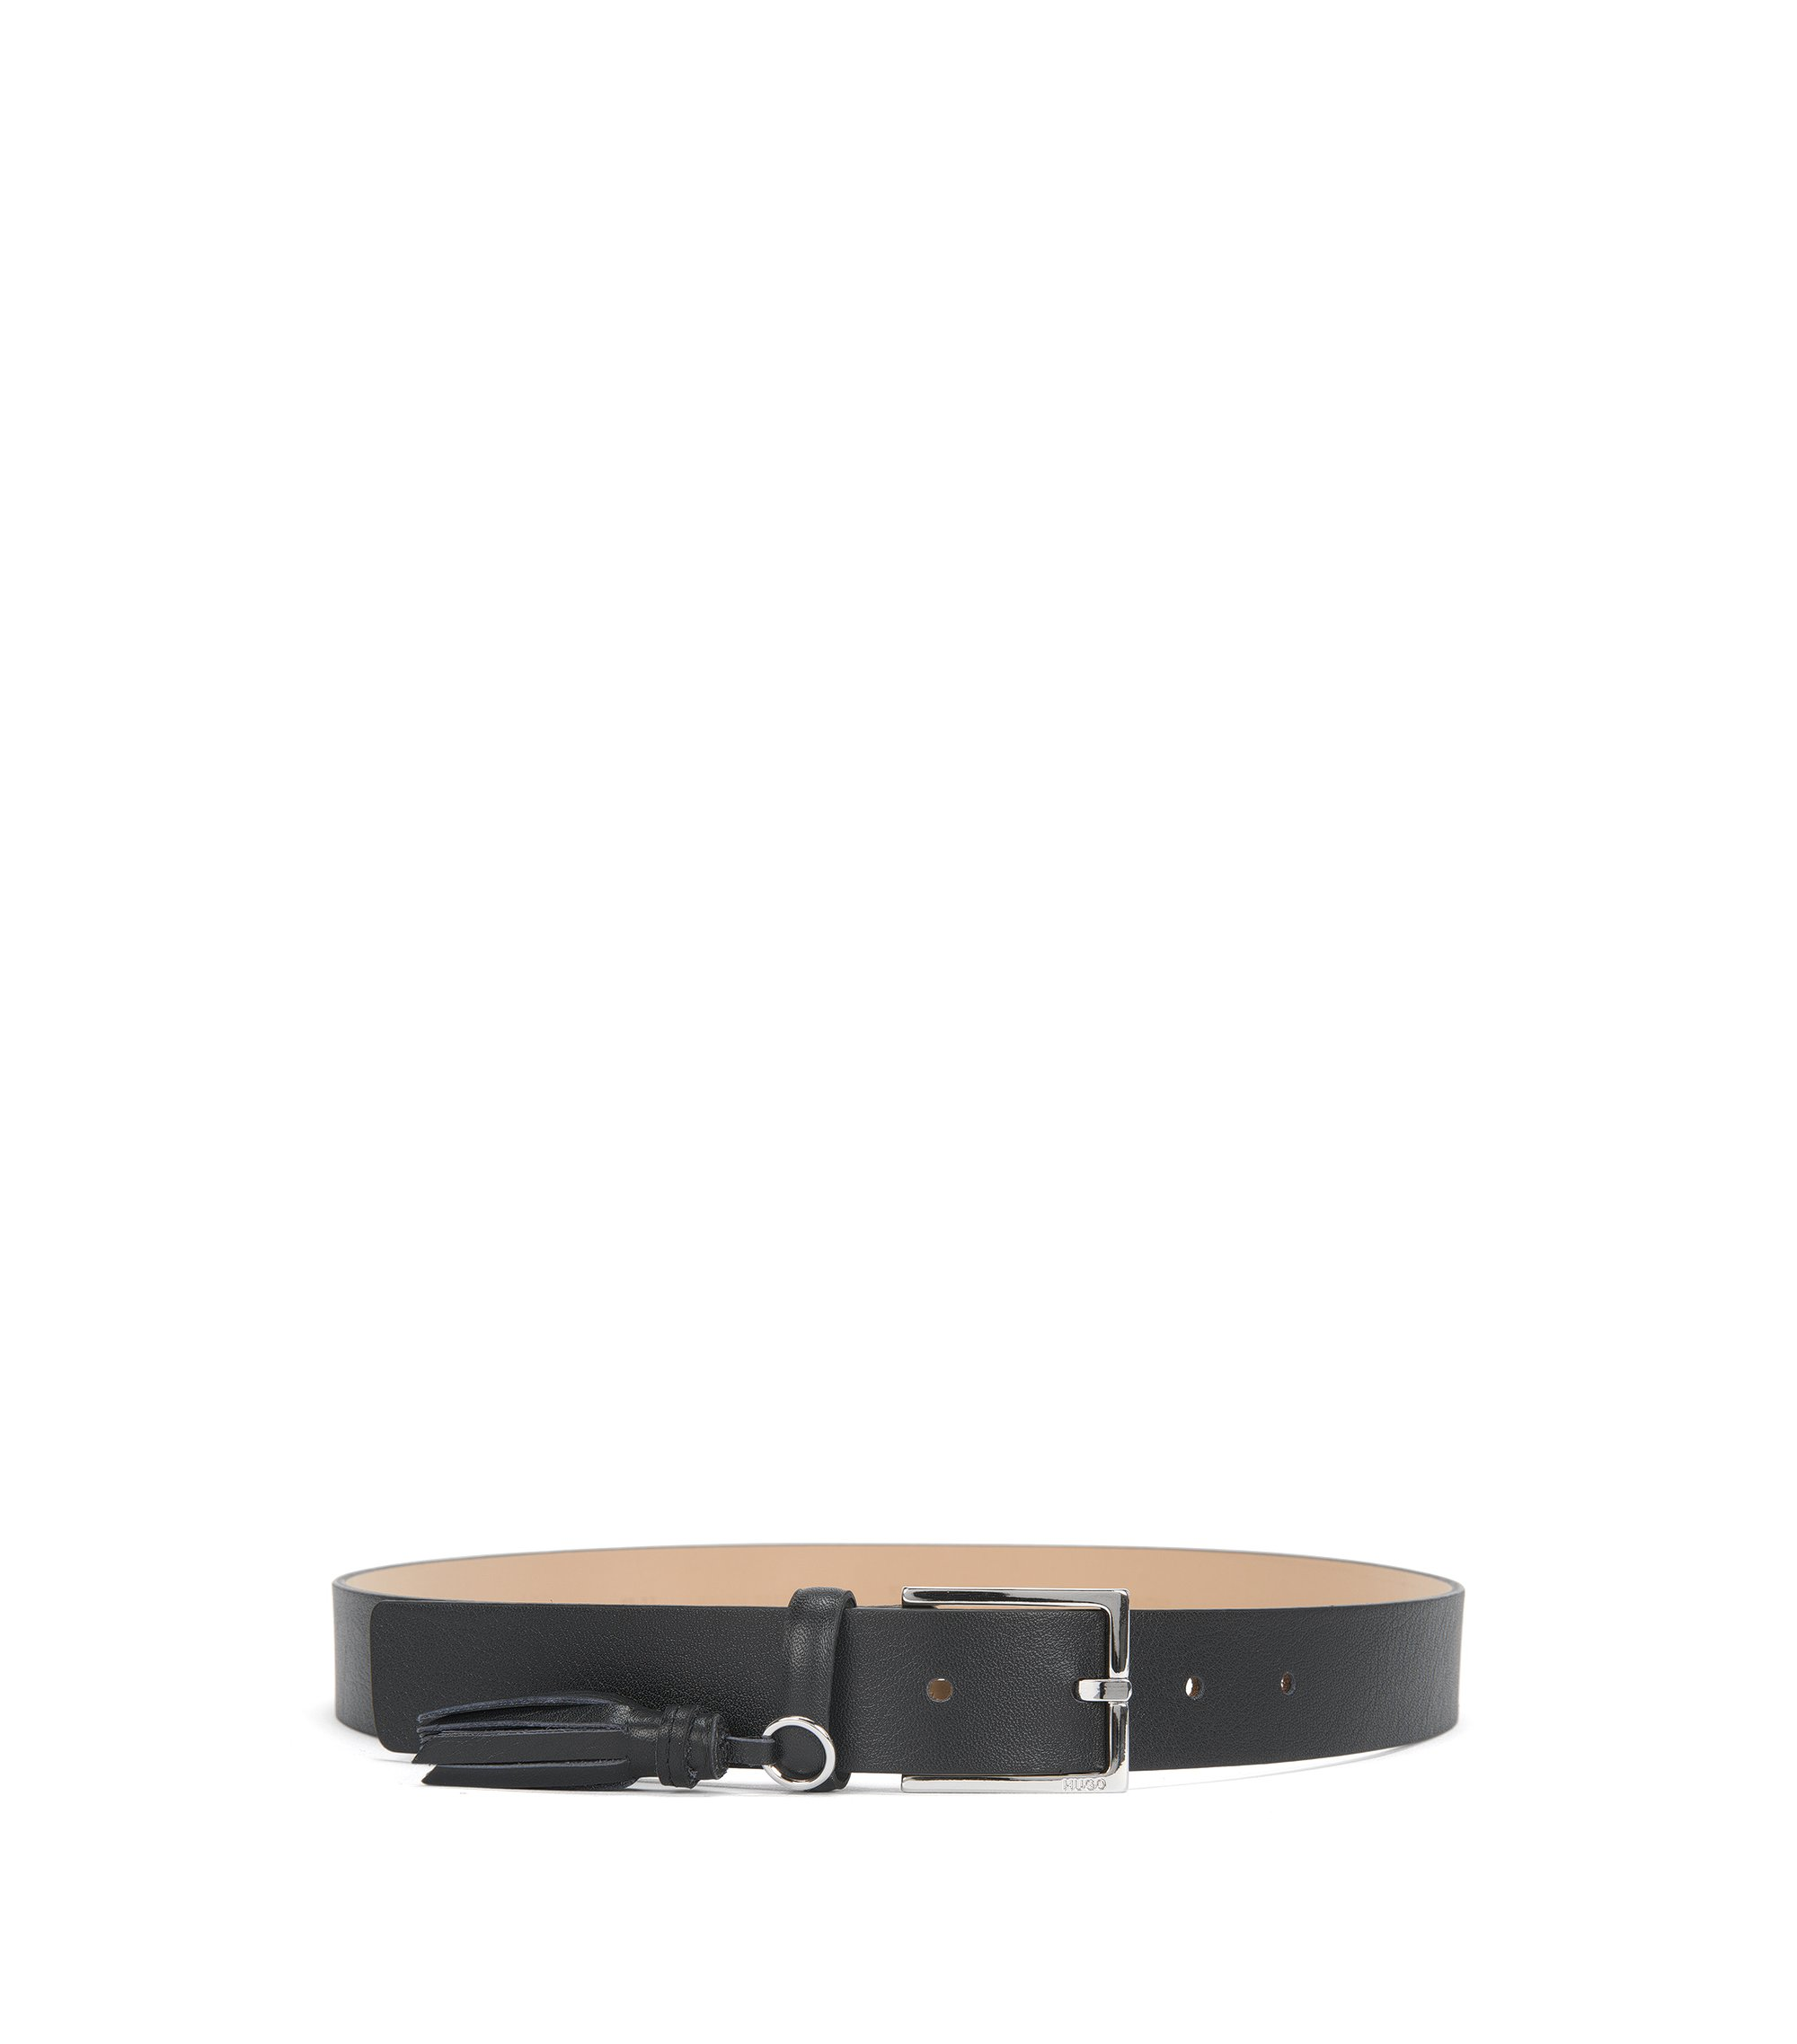 Leather belt with tassel detail, Black